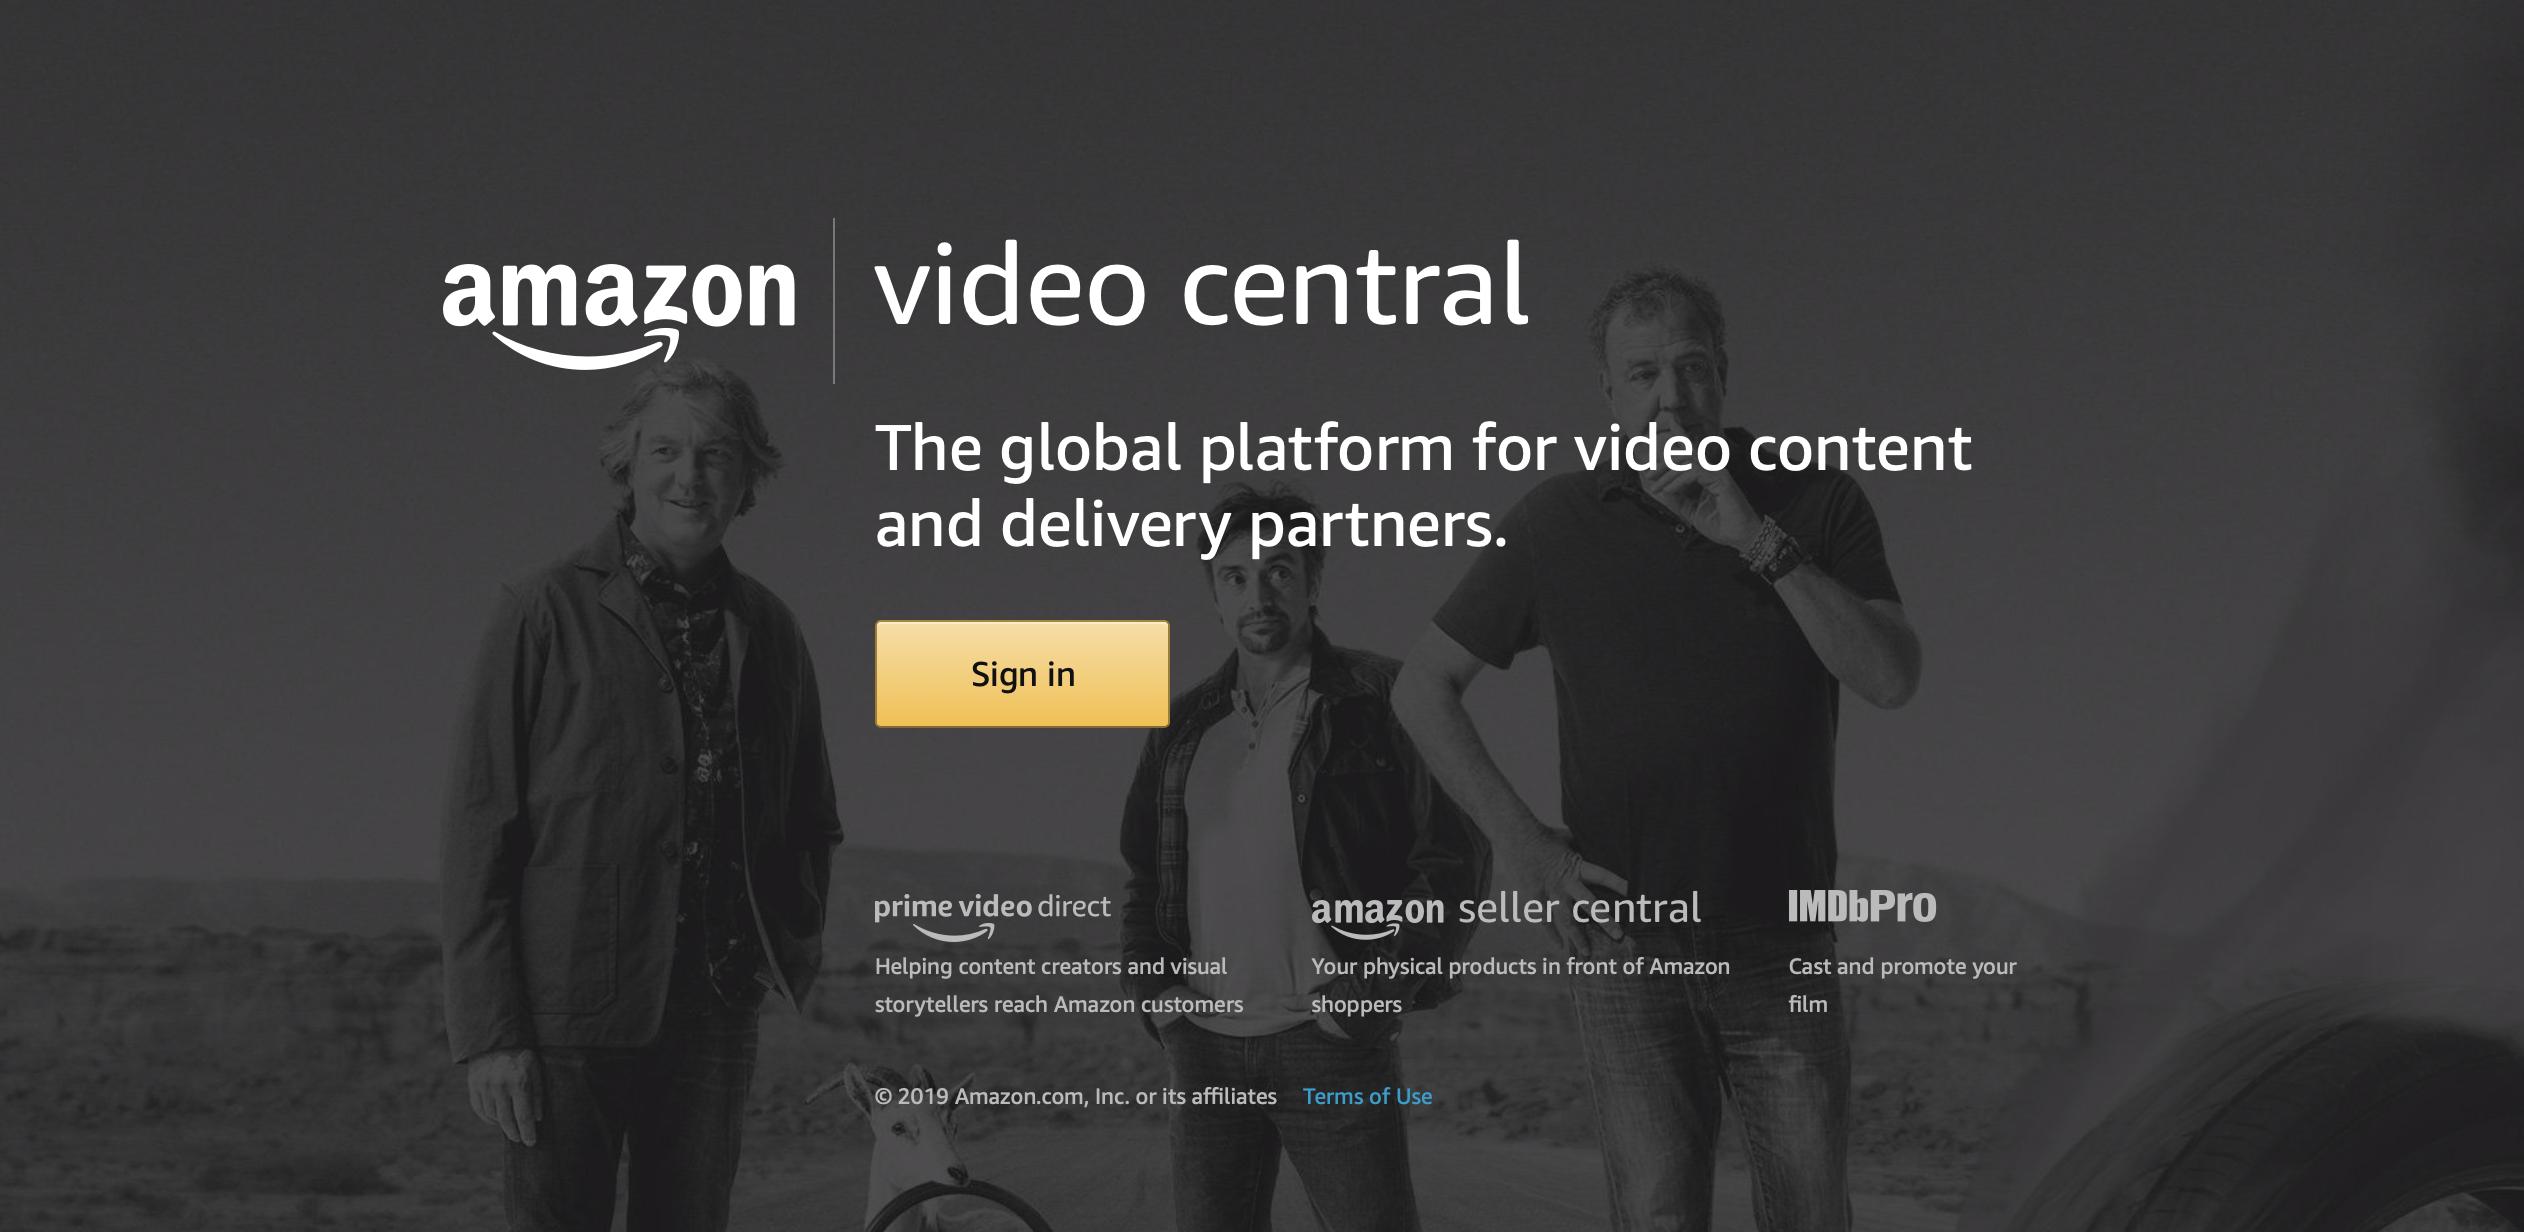 Amazon Video Central